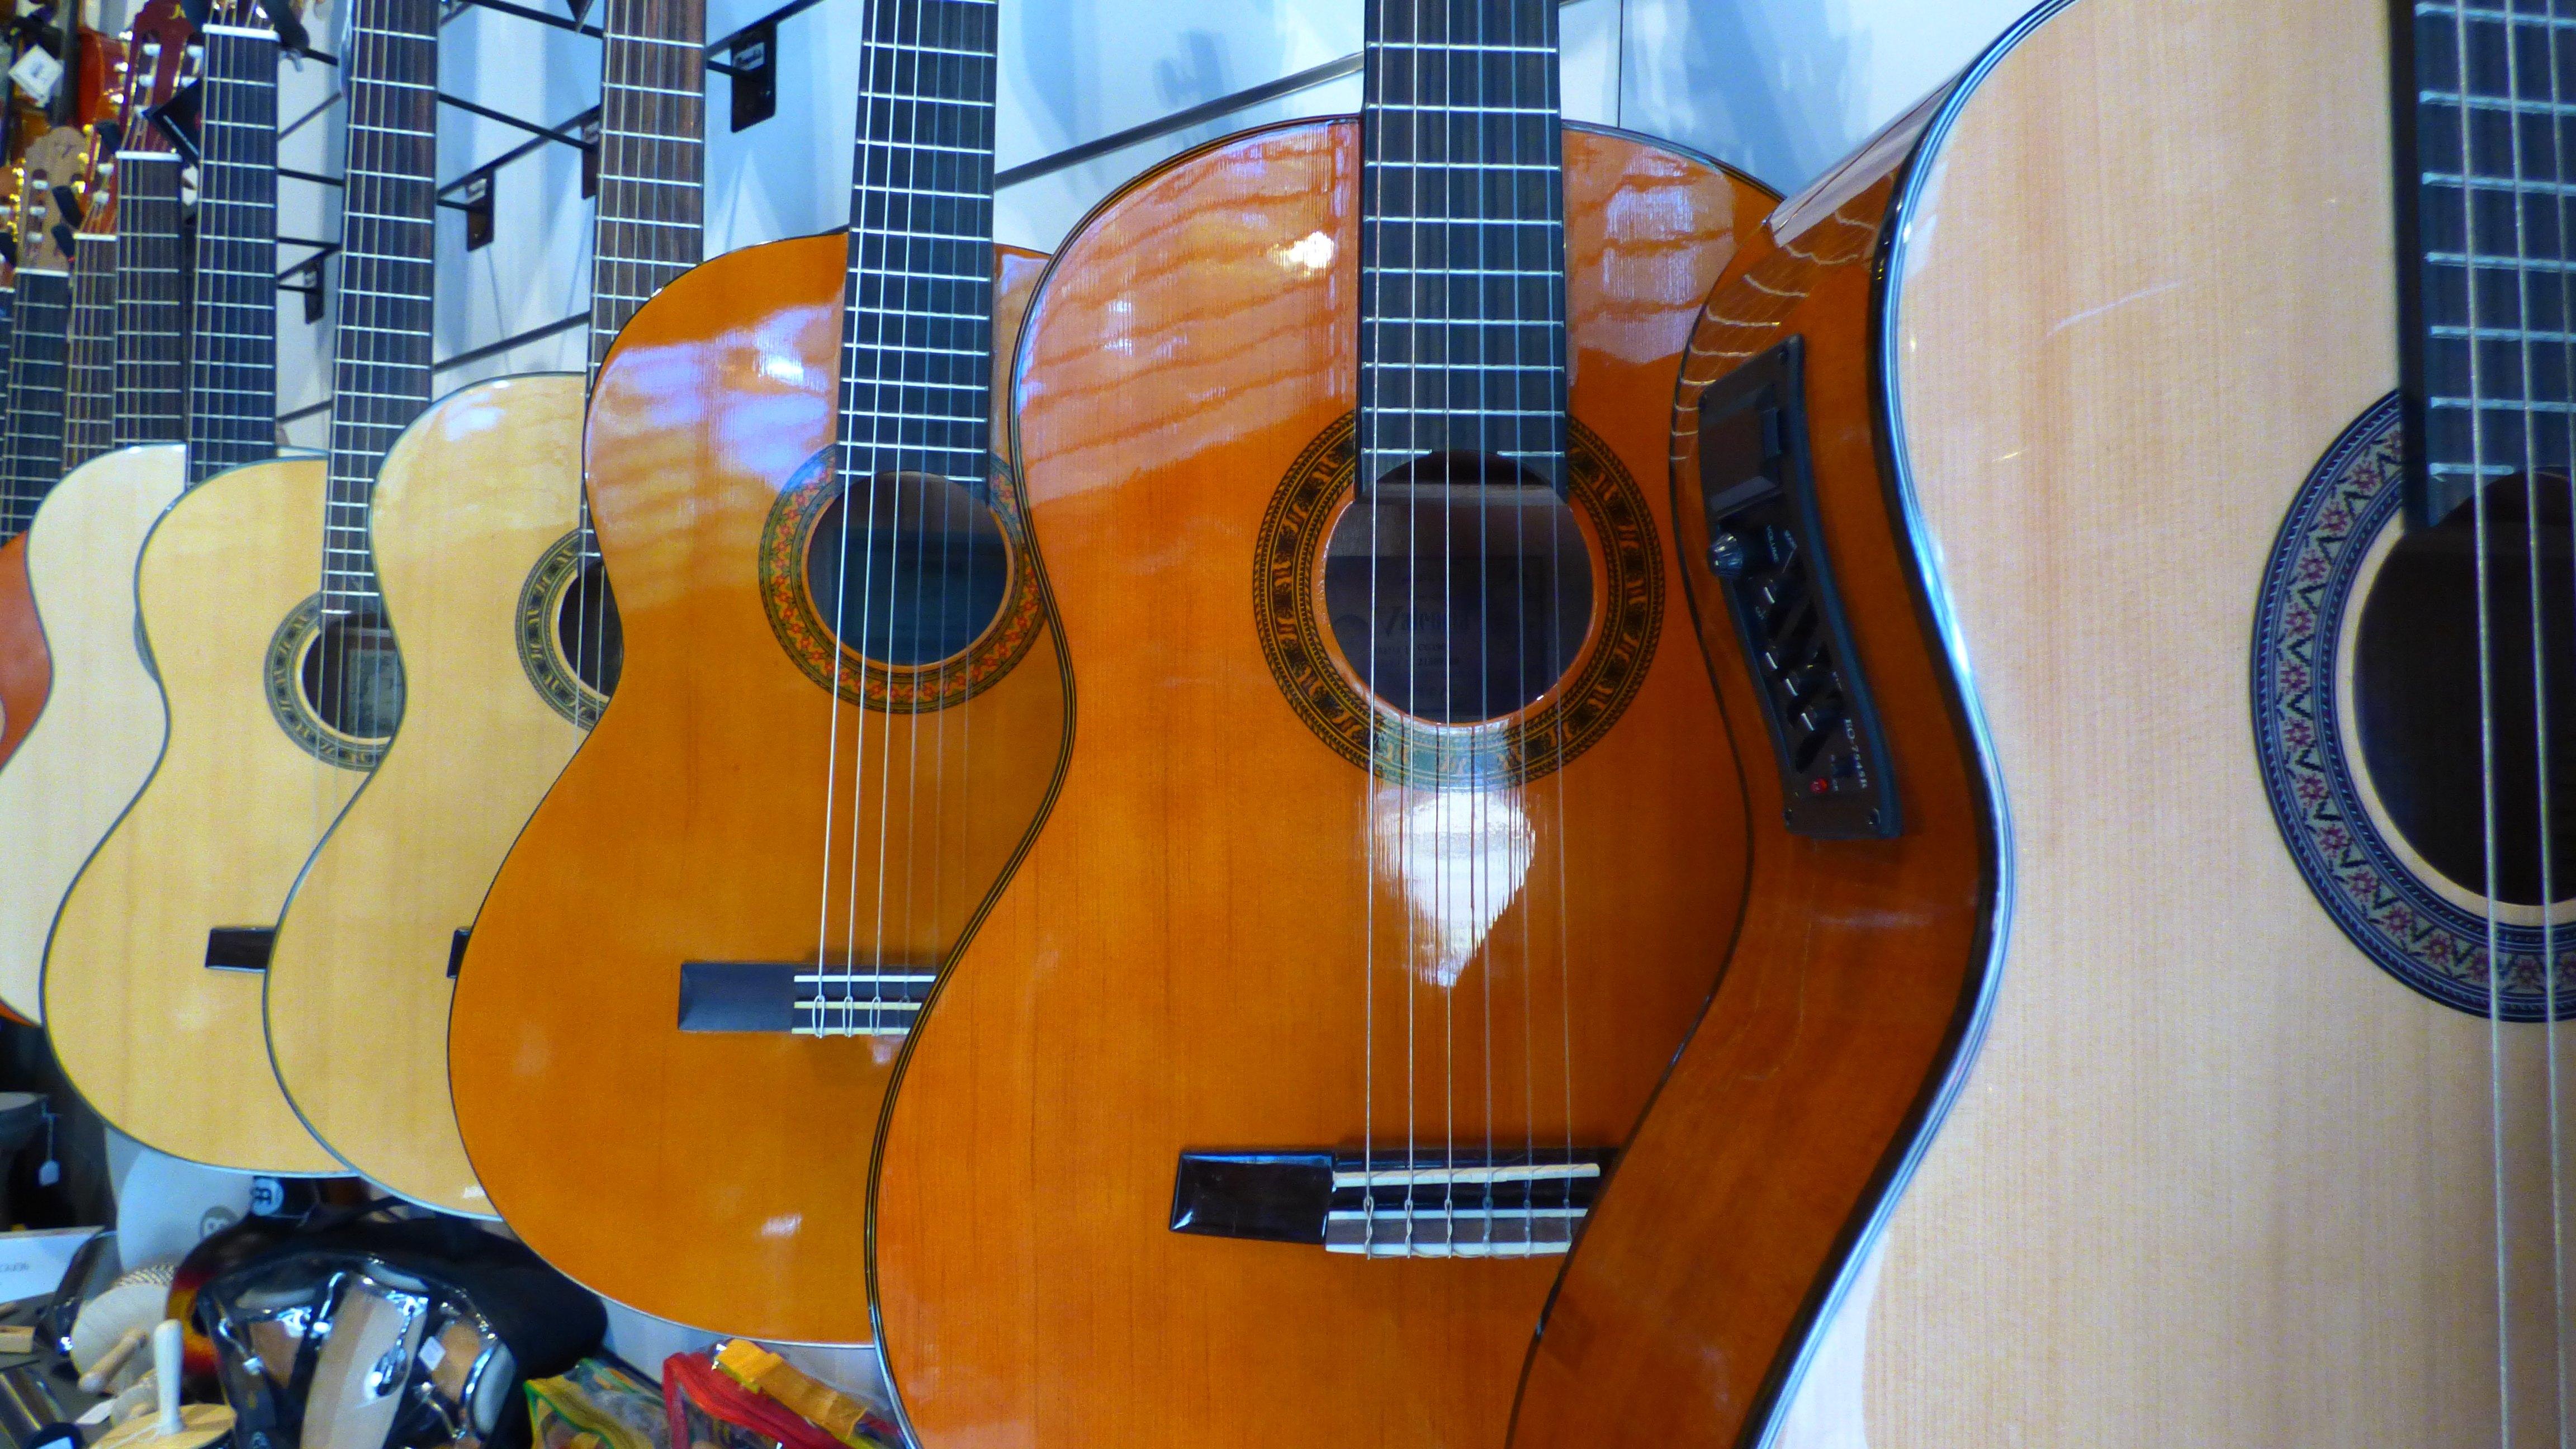 C mo elegir una guitarra electrica para ni os for Guitarras la clasica